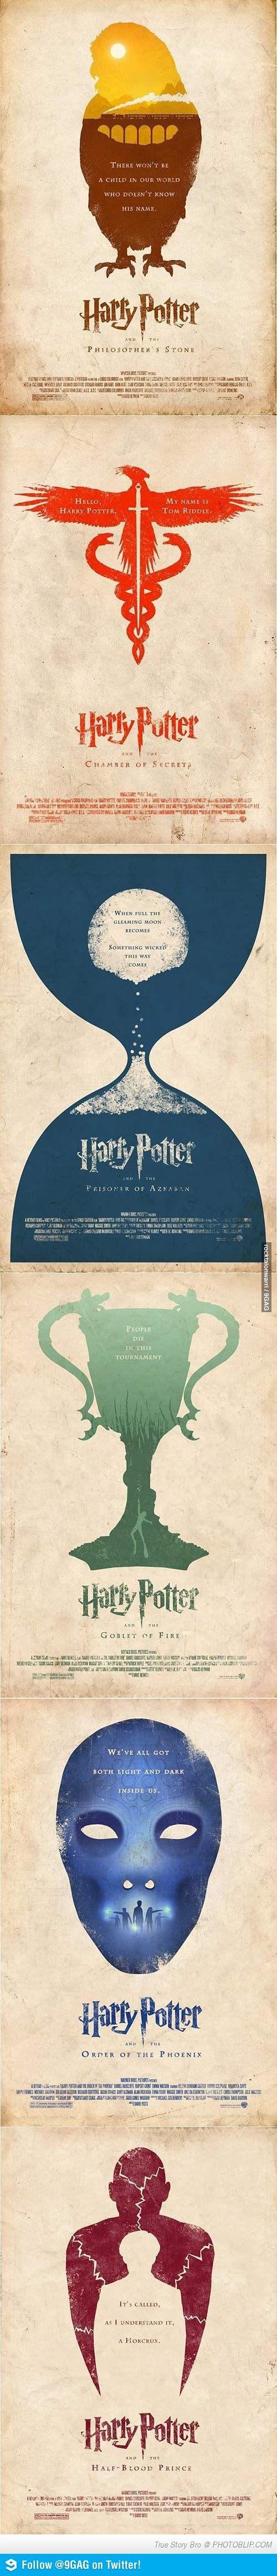 Alternate HP Posters 9gag